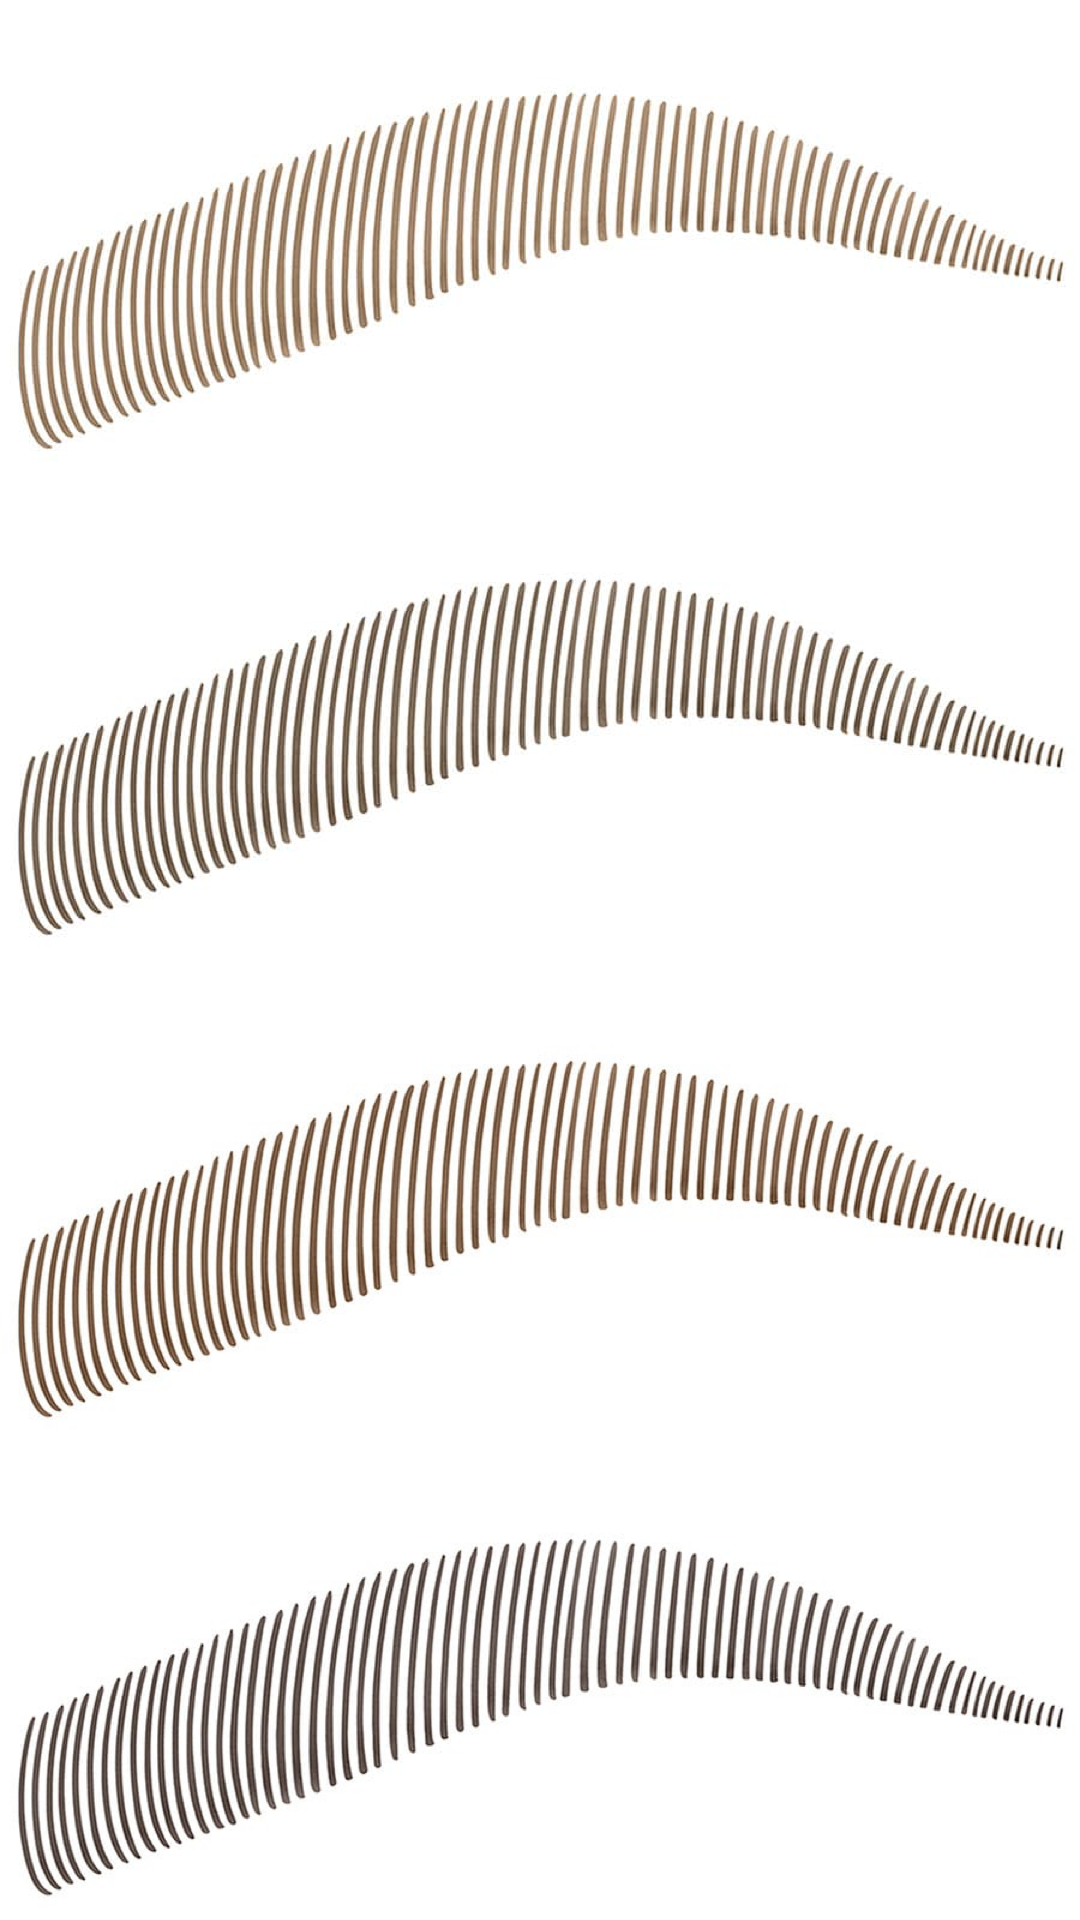 Benefit Brow Microfilling Pen Brow Pen